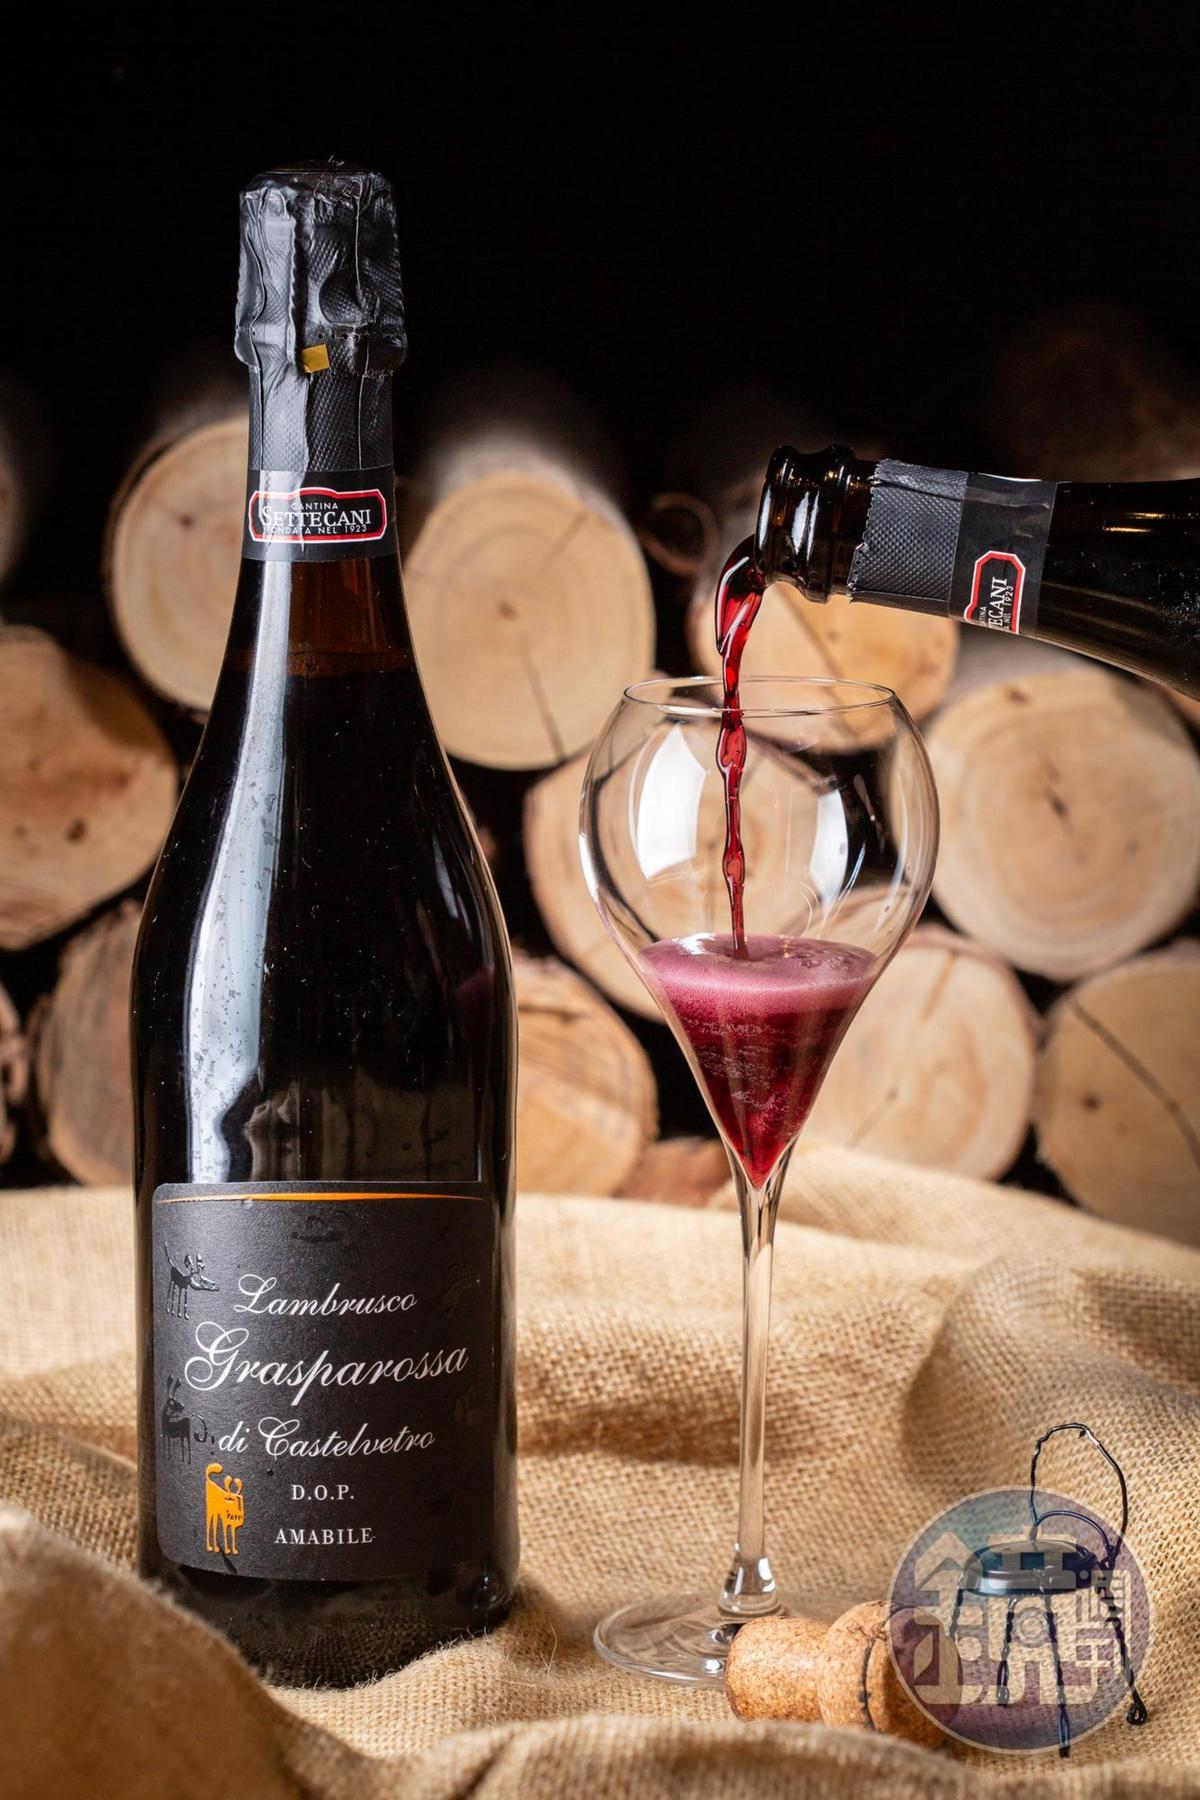 「Lamprusco Grasparossa Amabile DOP」是少見的氣泡紅葡萄酒,花青素含量極高,造就紫羅蘭般夢幻色澤,花果甜香挑逗少女心。(3,600元/6瓶、箱)